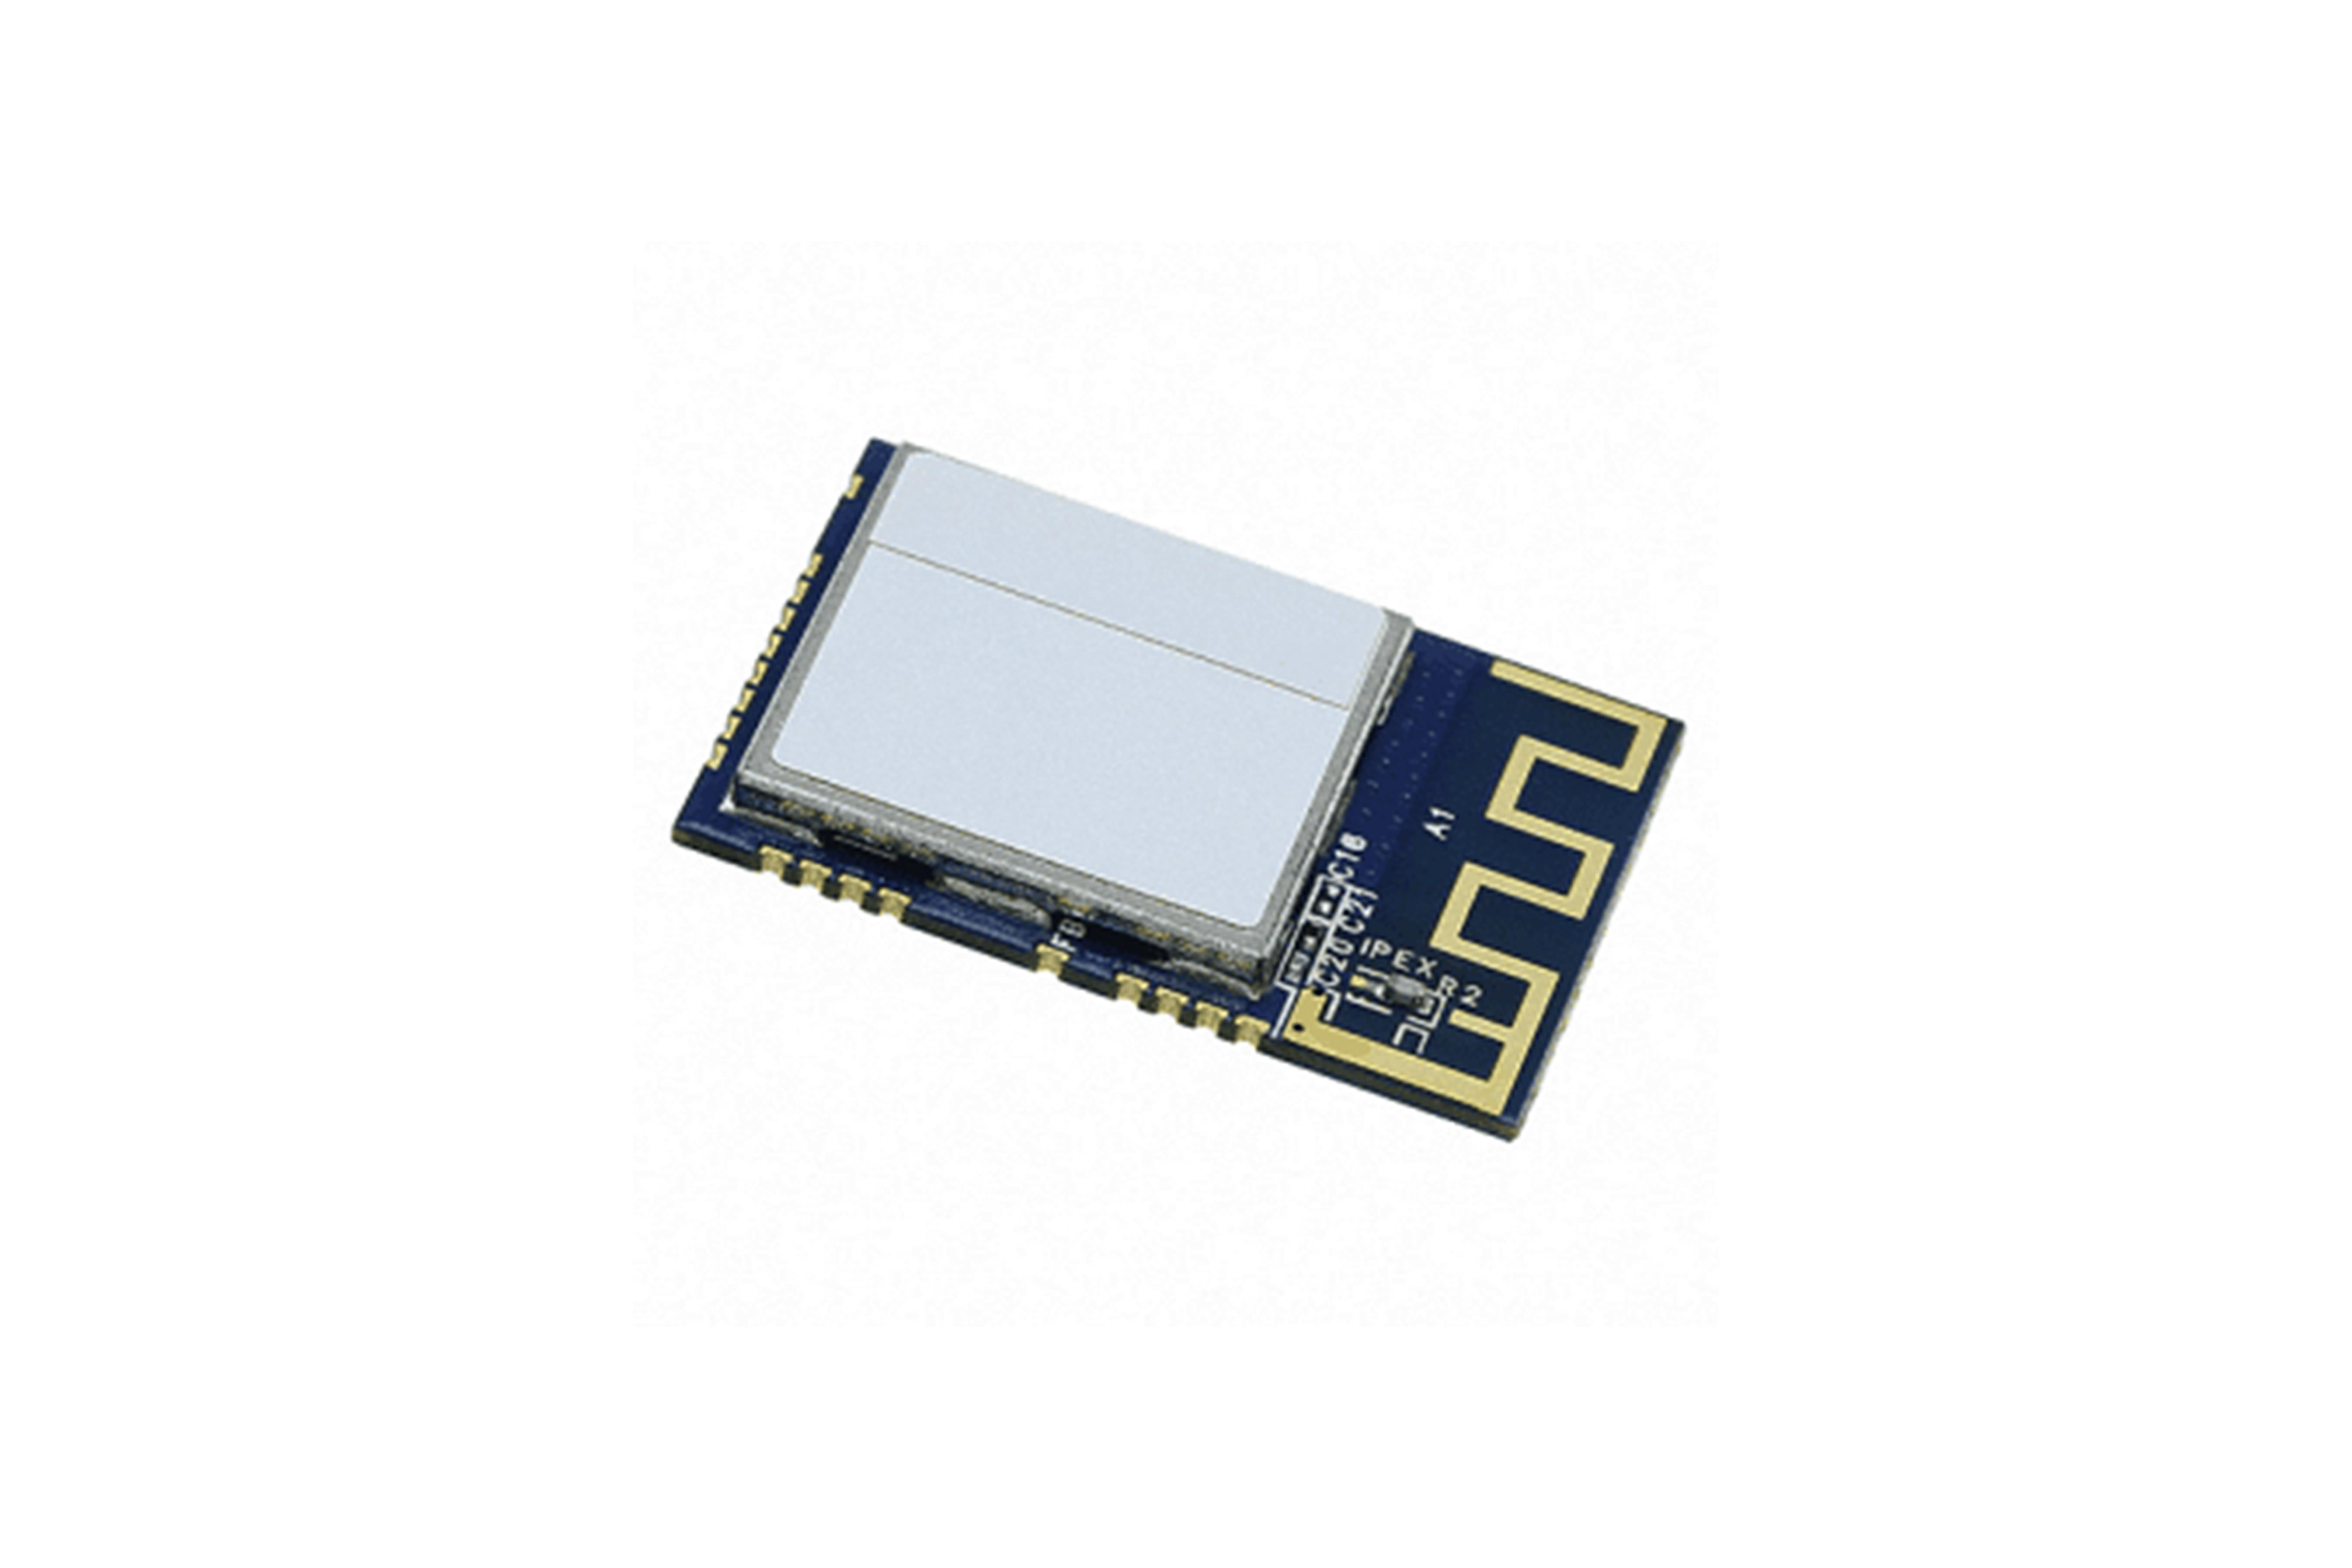 SmartConnect module ATWILC1000 802.11 b/g/n